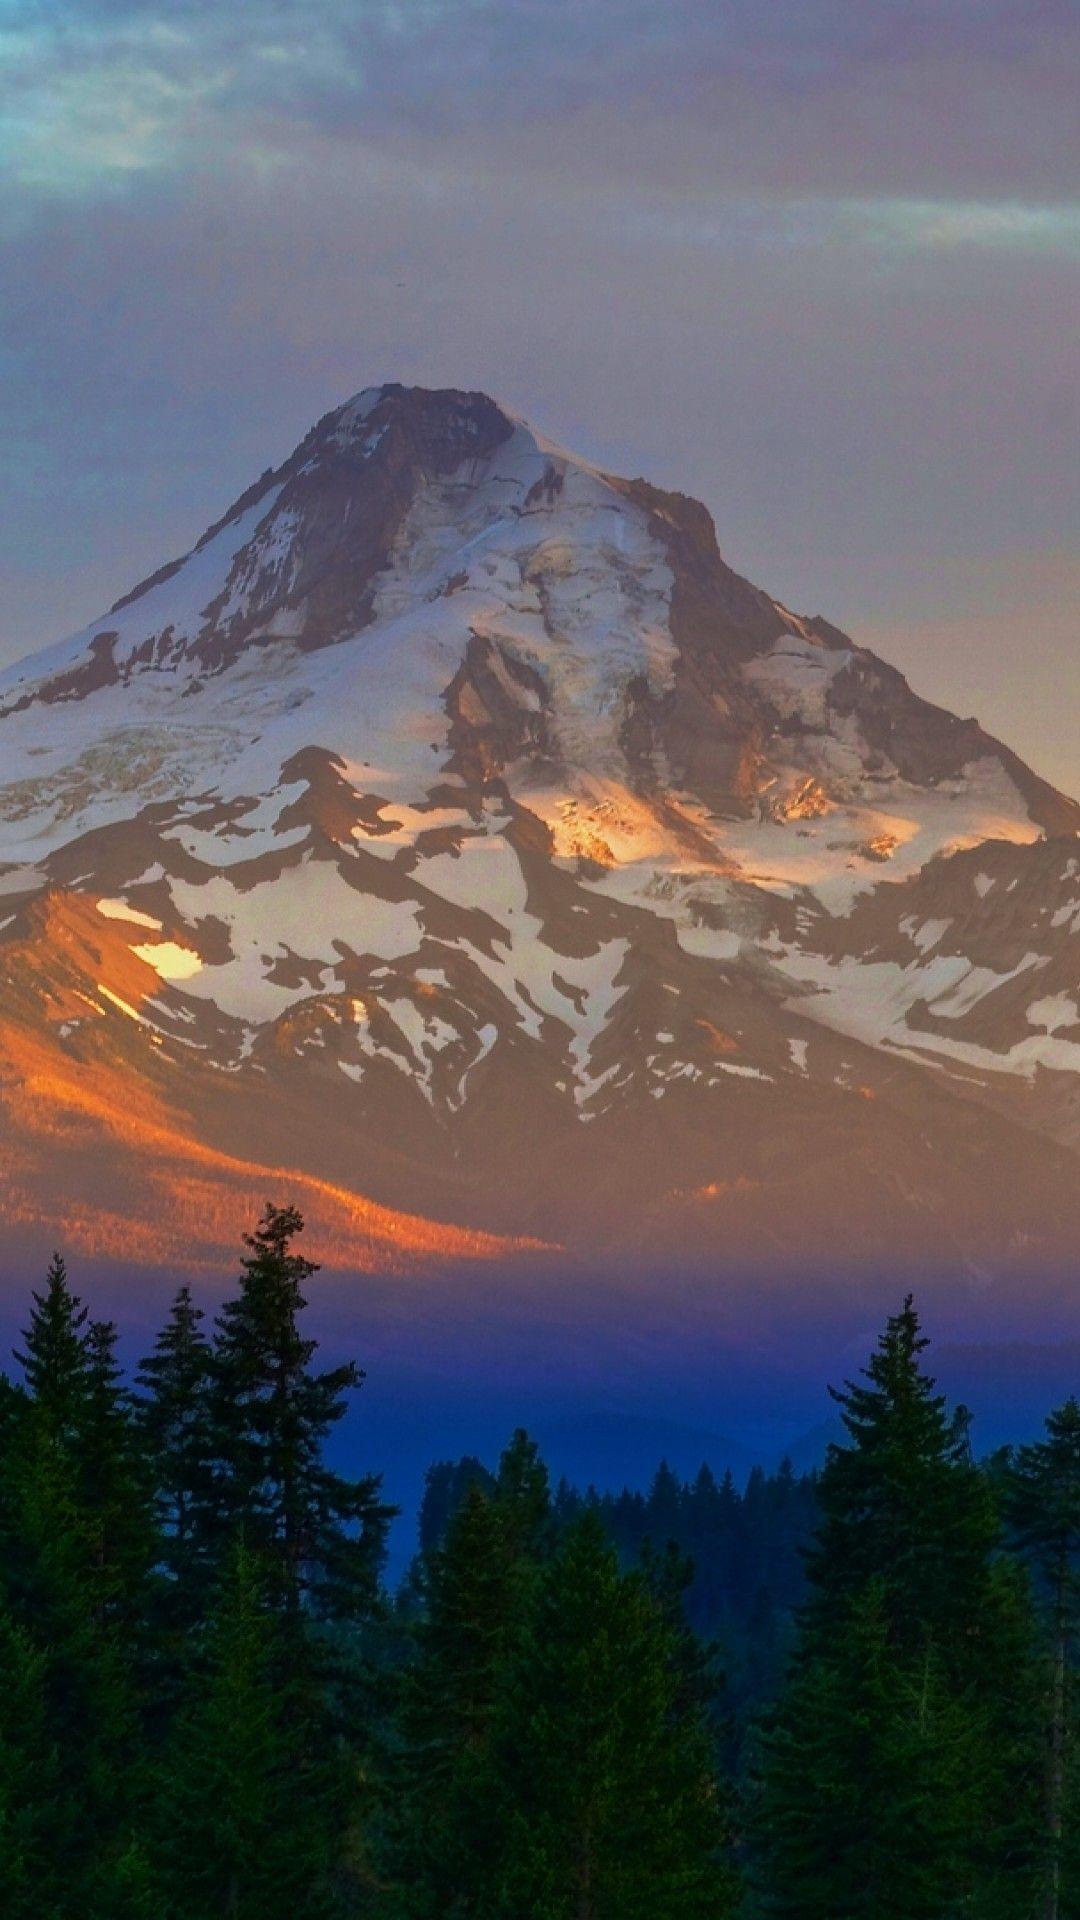 Wallpaper Iphone Sunset Mountains